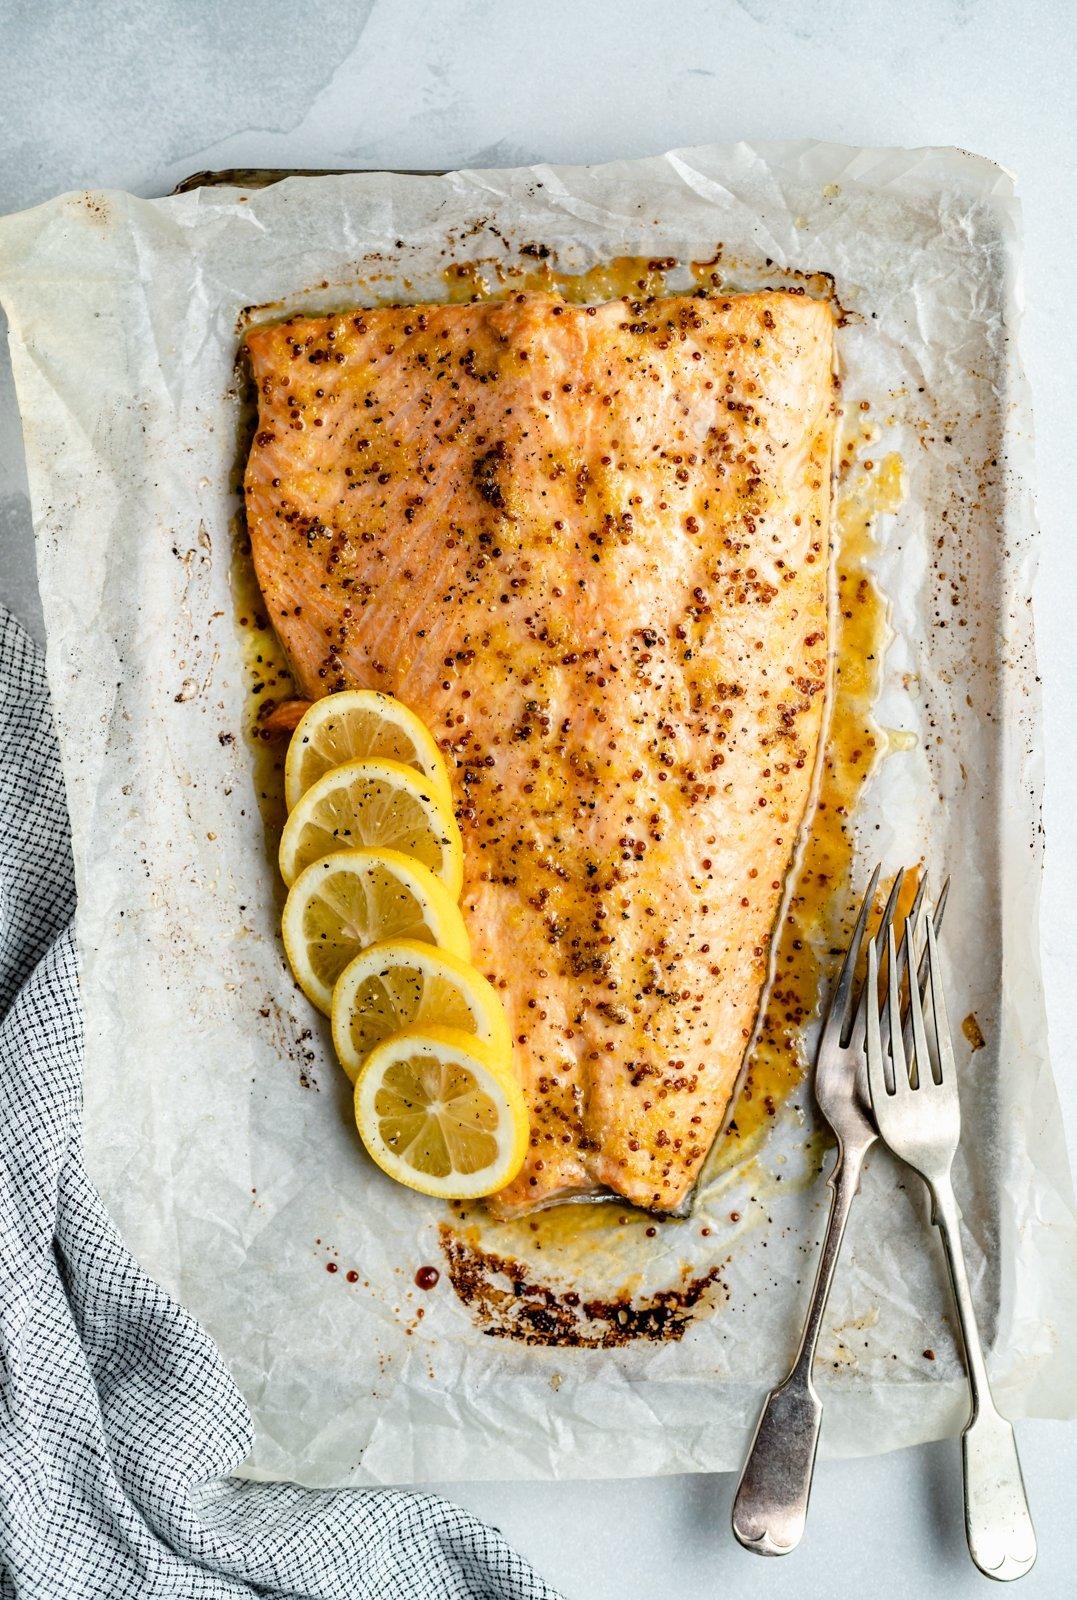 lemon garlic salmon on a baking sheet with lemon slices